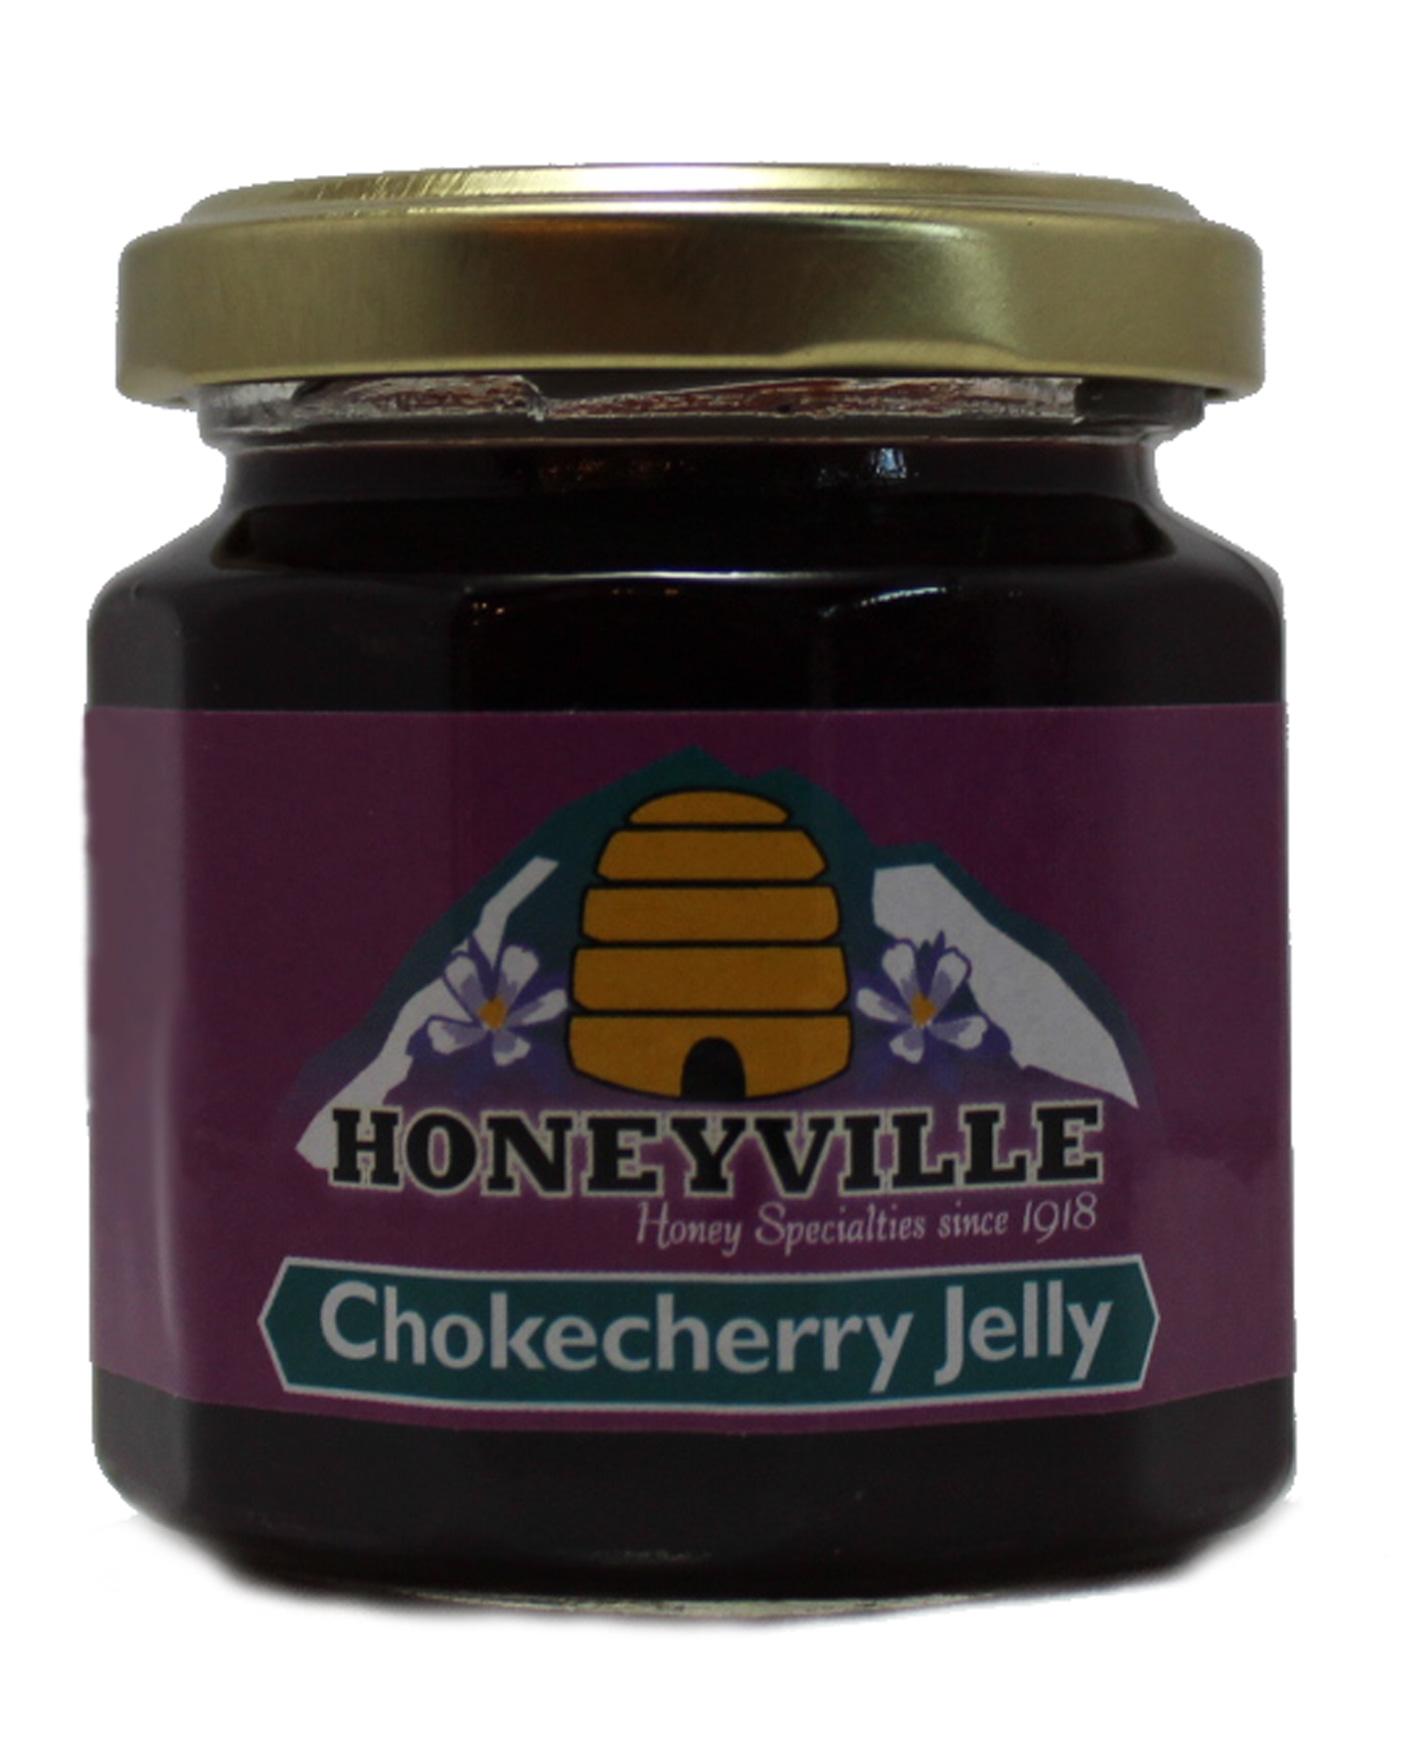 Mini:  Wild Chokecherry jelly